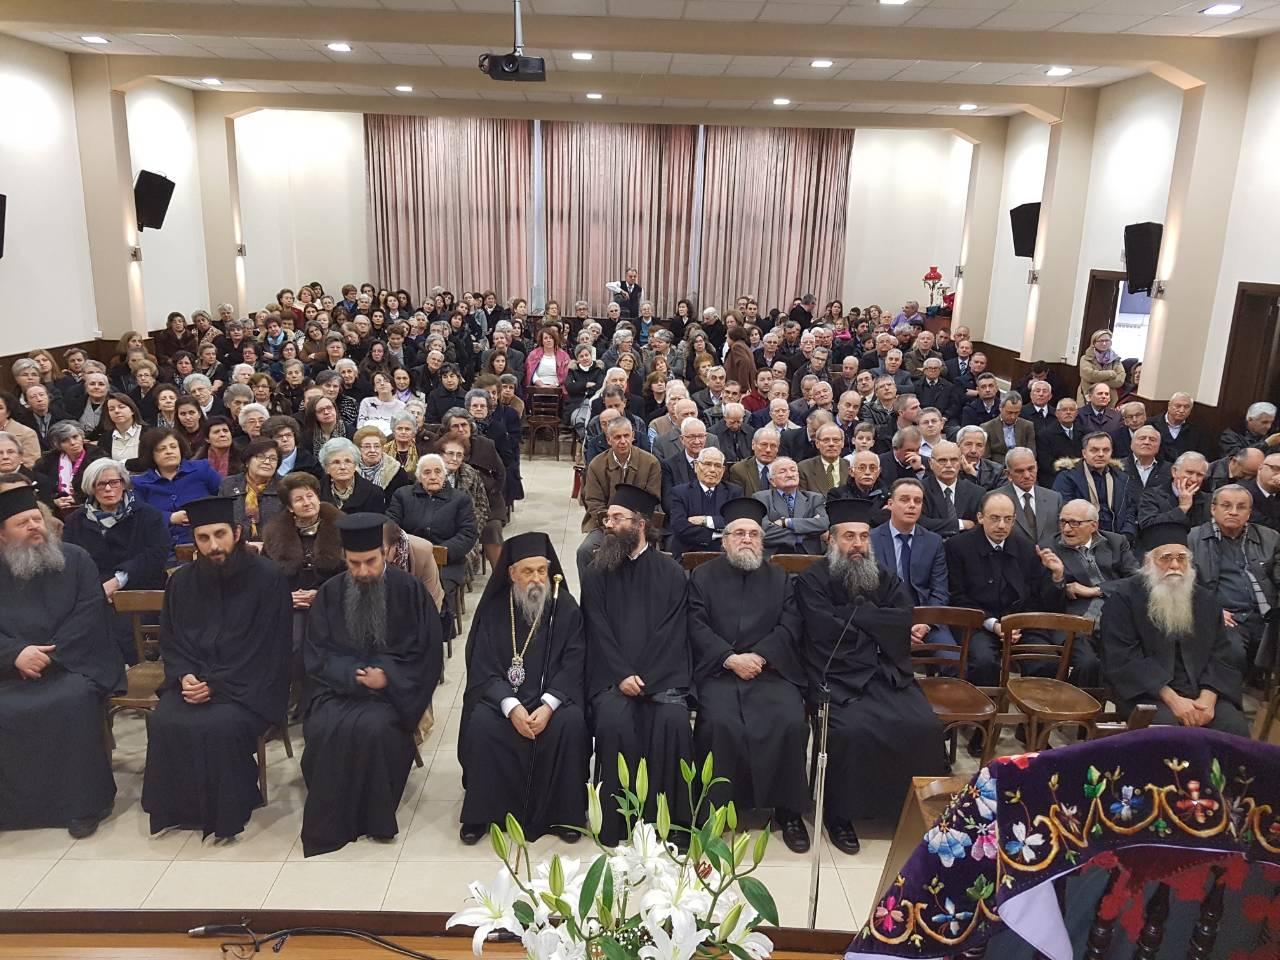 madenlidis pyrosvestikis 29 - O Σεβασμιώτατος ευλόγησε την εντυπωσιακή επίδειξη από την Πυροσβεστικής Υπηρεσίας Λάρισας